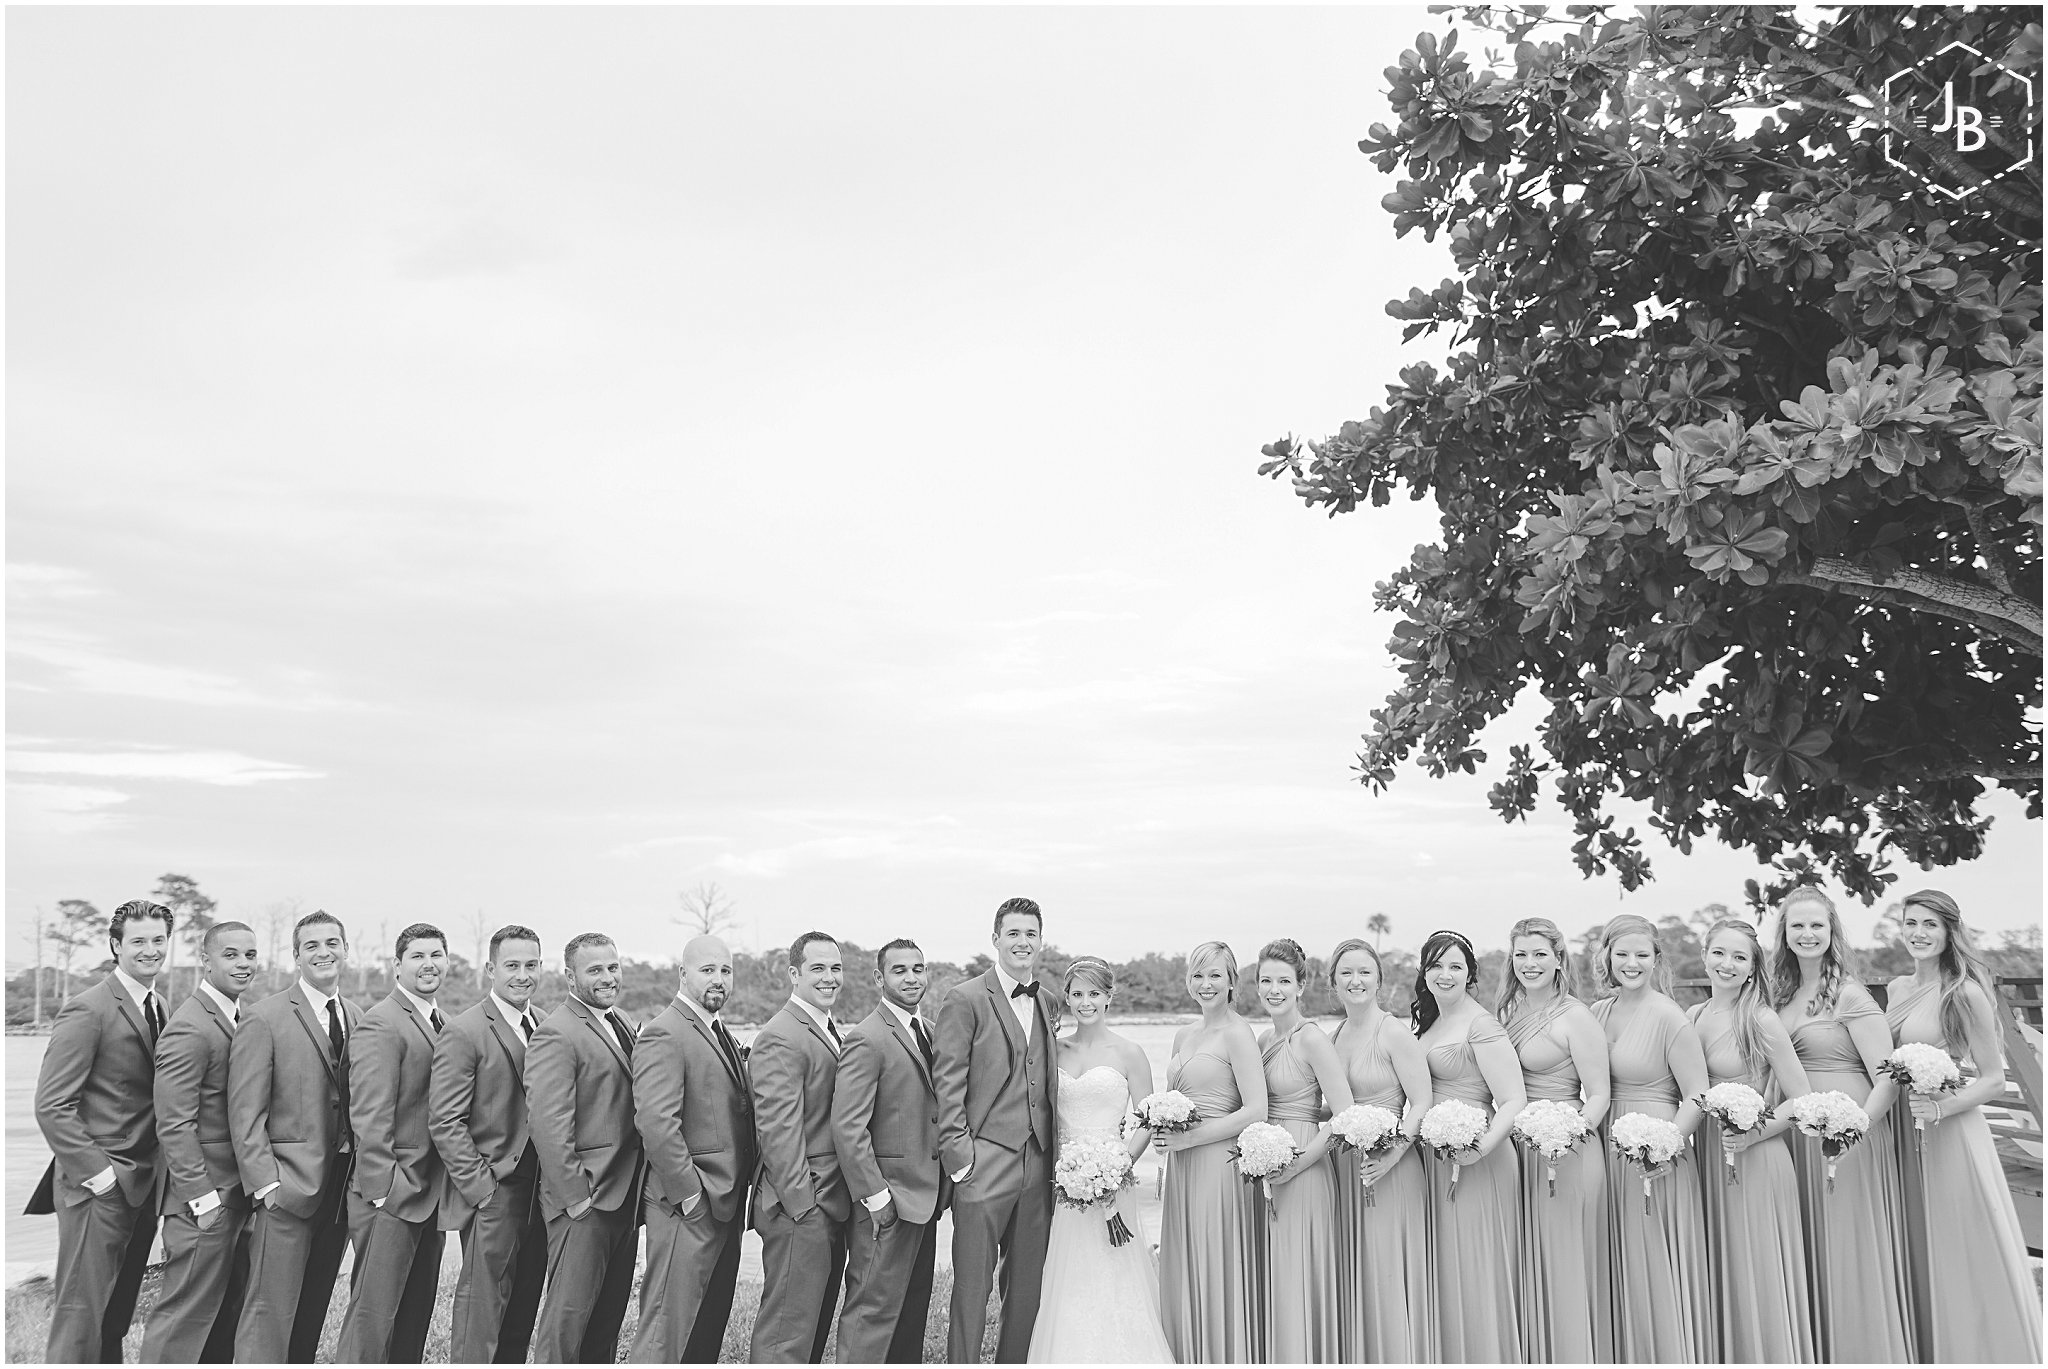 WeddingandEngagementFloridaPhotographer_0347.jpg